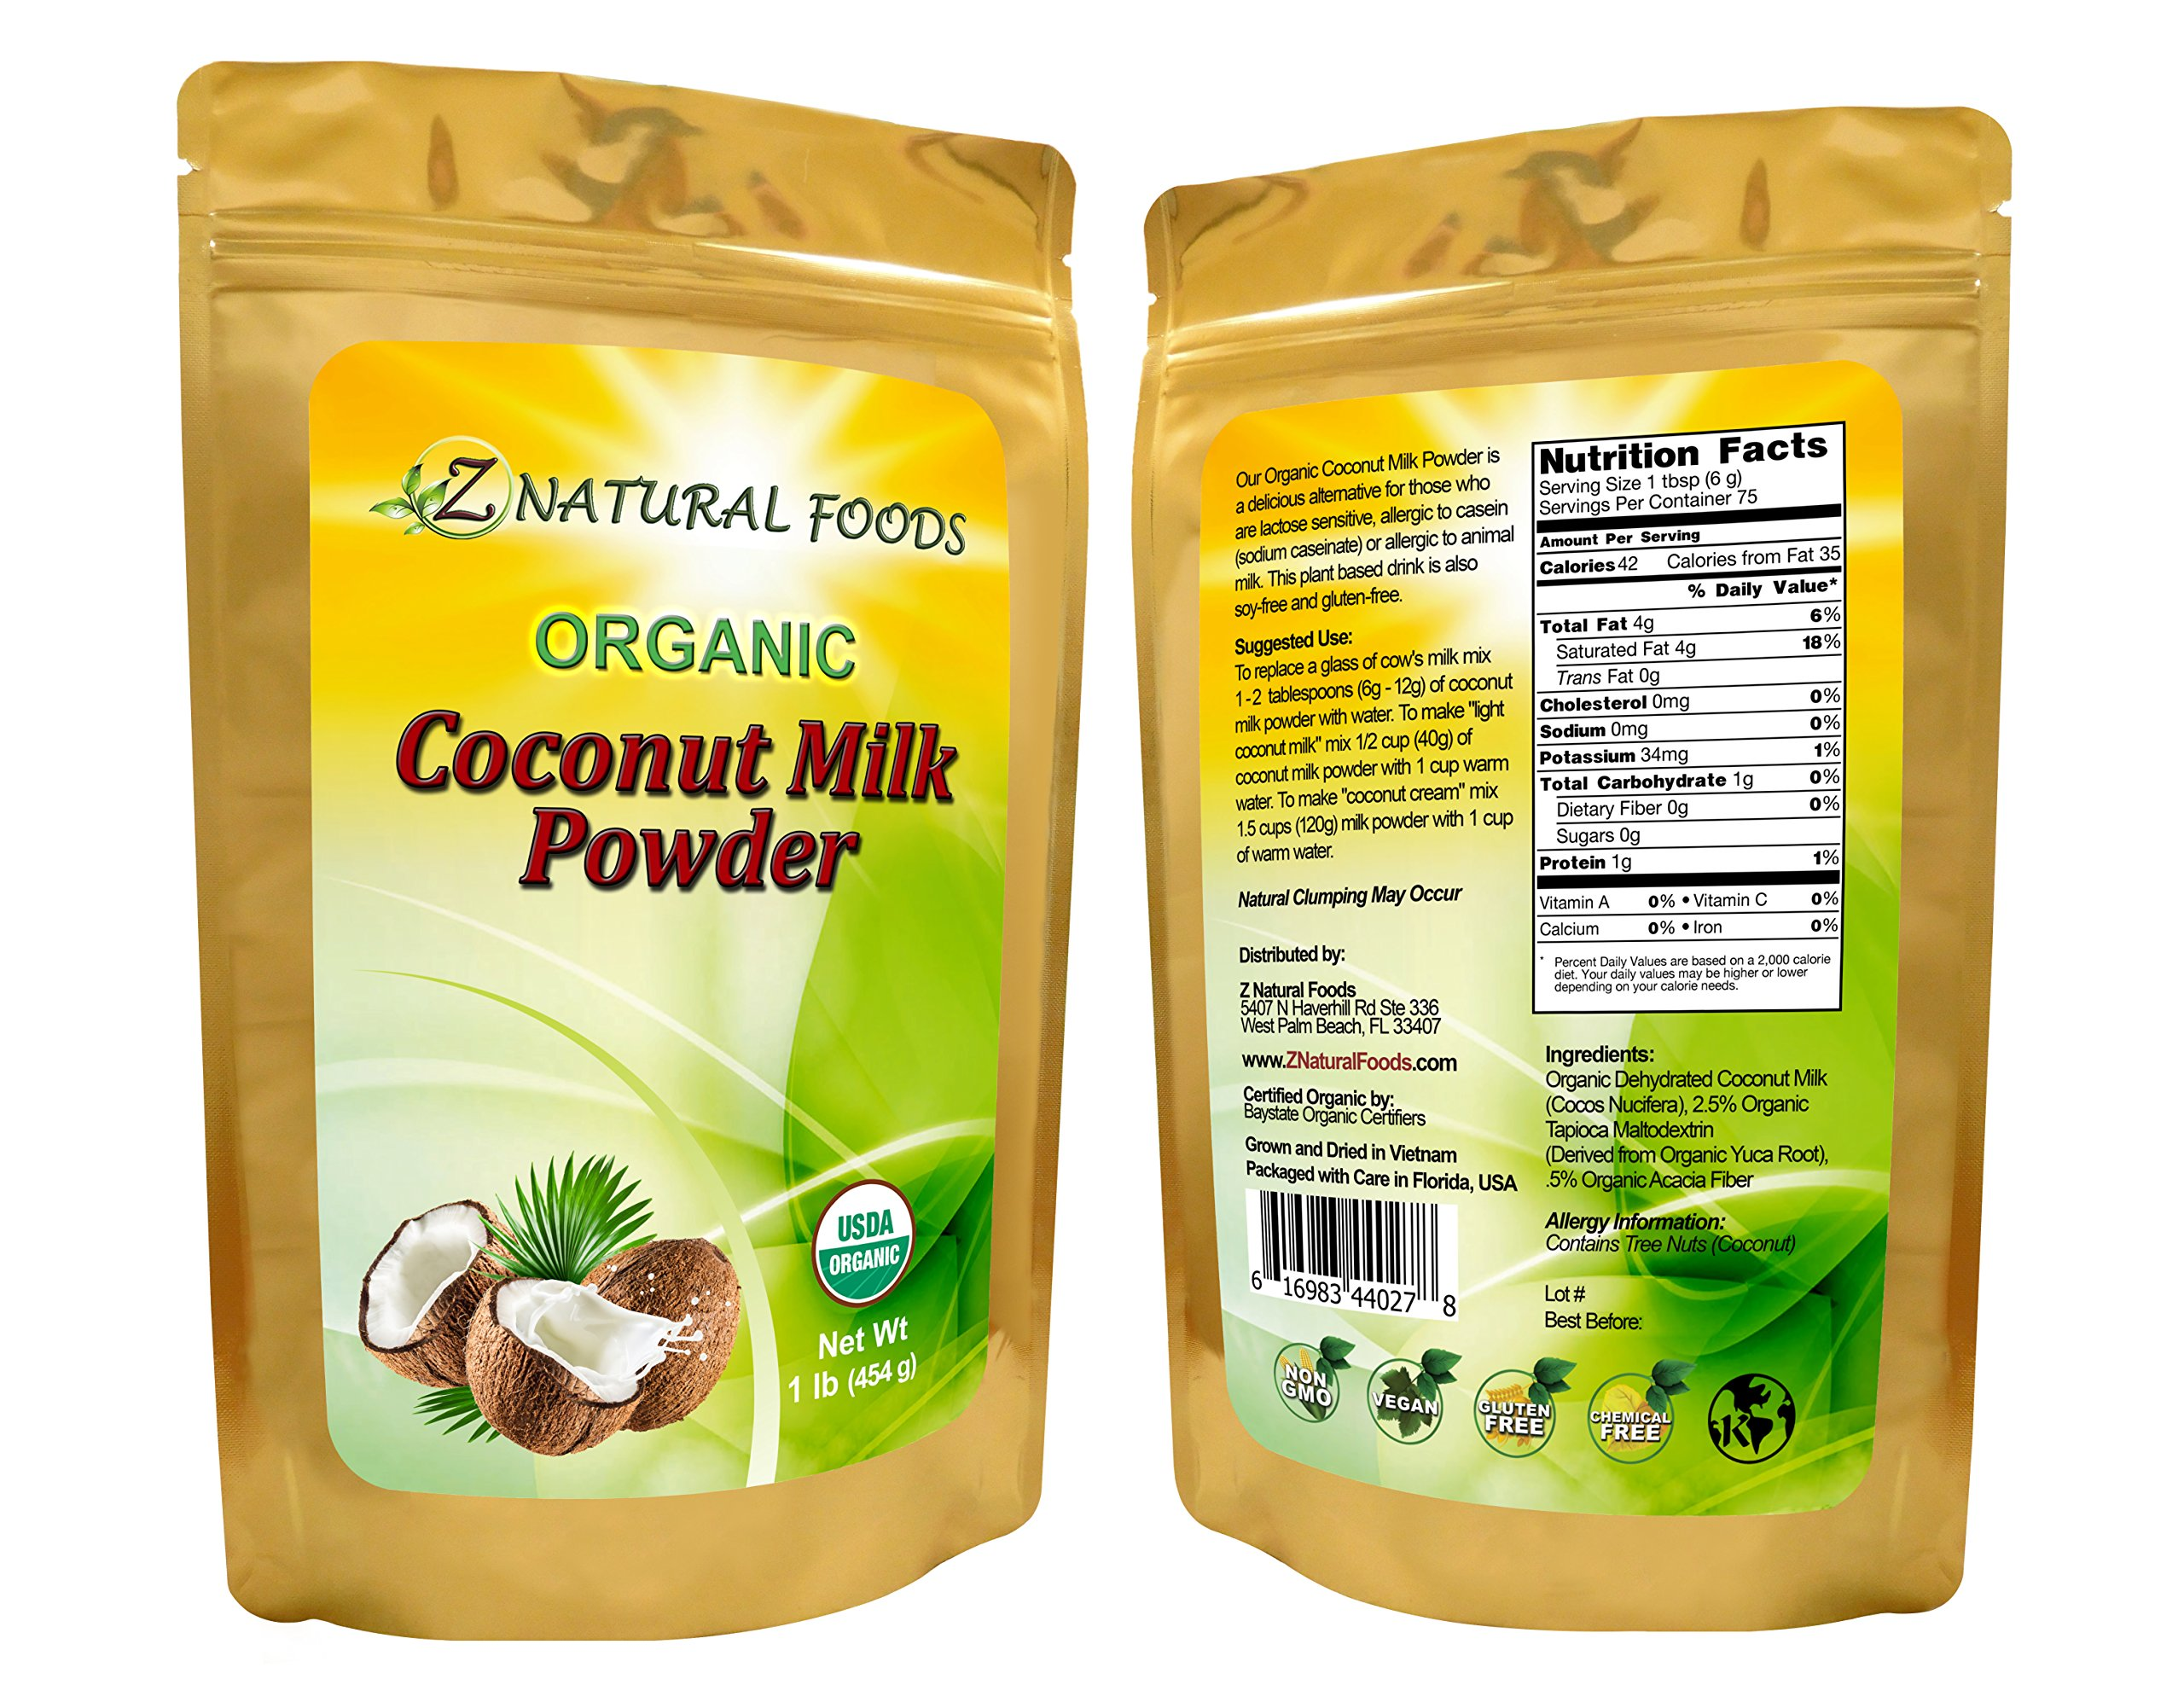 Z Natural Foods - Organic Coconut Milk Powder - Kosher, Vegan, Fresh, Gluten Free, All-Natural, Dairy Free, Non-GMO, Keto, Paleo Diet Friendly (1 lb)